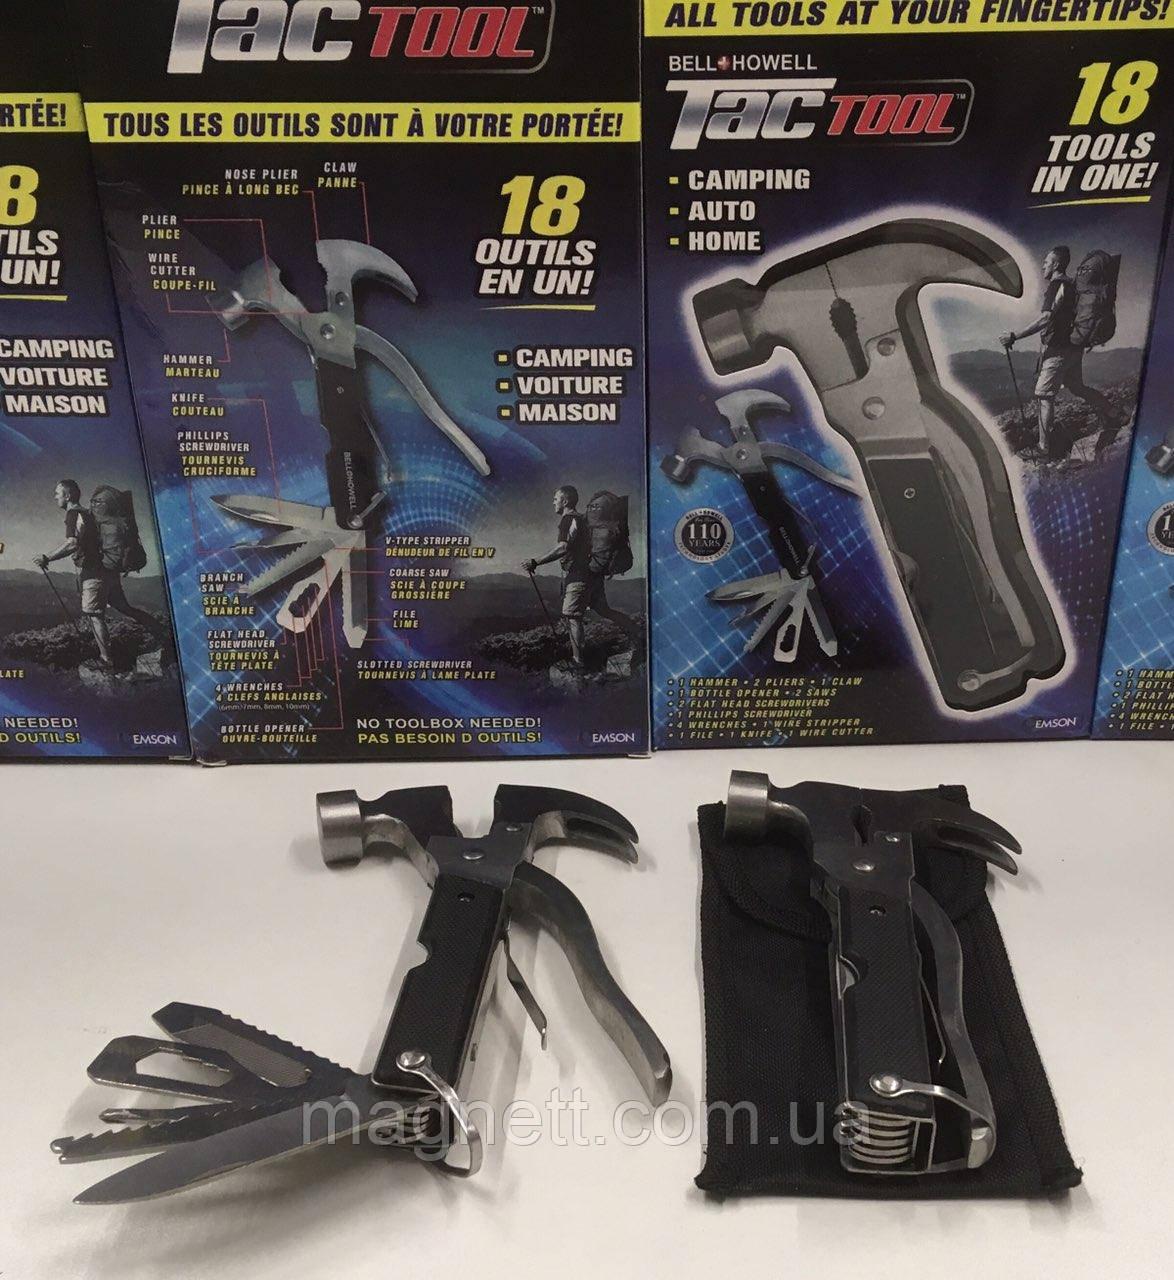 Молоток-гвоздодер Tac Tool 18 в 1 Мультитул